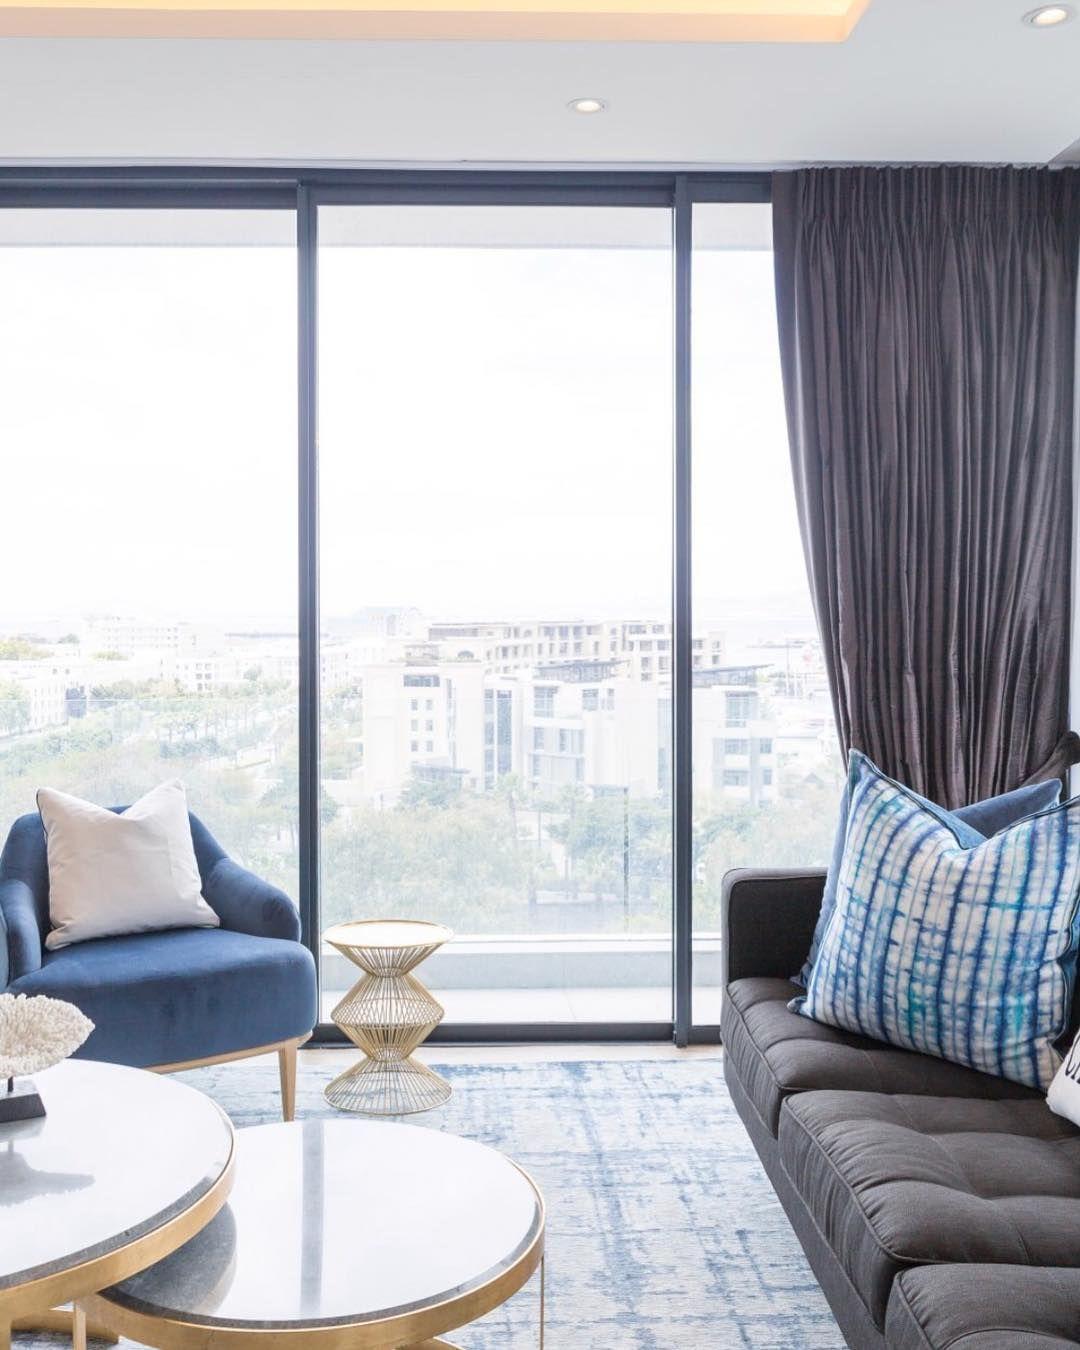 Living Room with a view! The latest happenings @midcitydecor ⠀⠀⠀⠀⠀⠀⠀⠀⠀ #midcitydecor #inspiringinteriors #livingroom #interiordesign #homestaging #houston #staging #decor #design #interiors